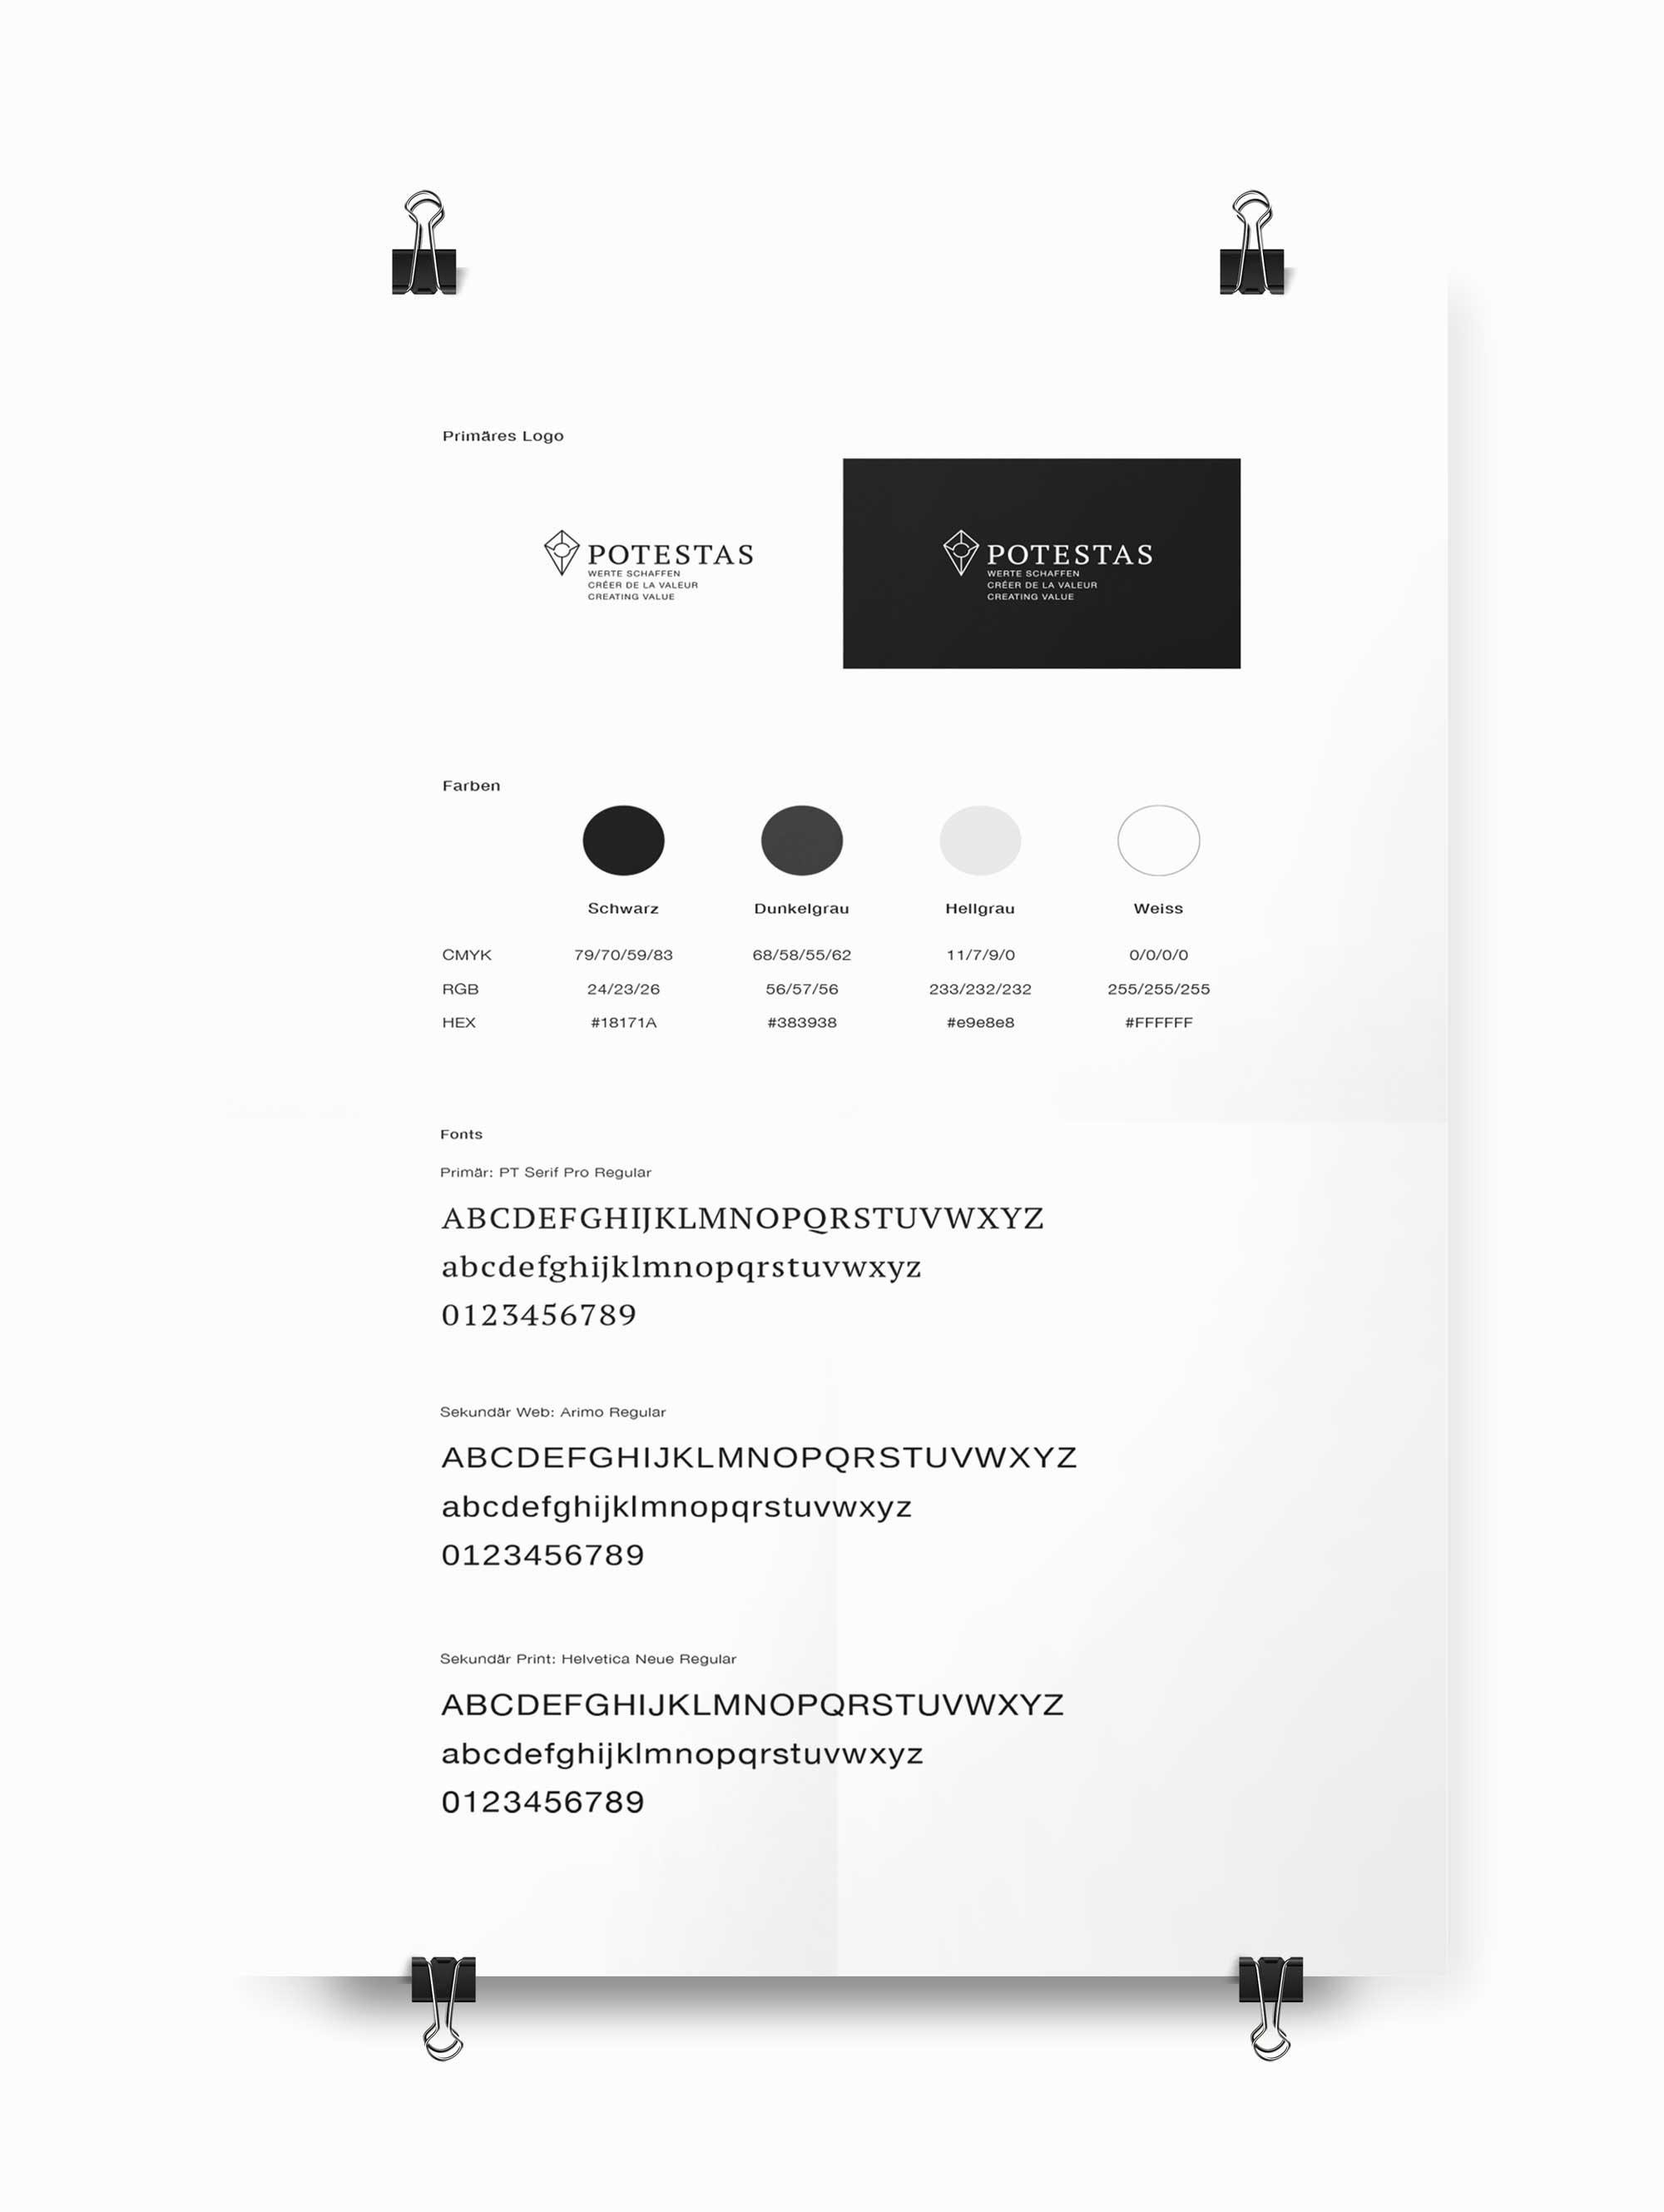 Design Guide CI/CD Immobilienfirma Schweiz